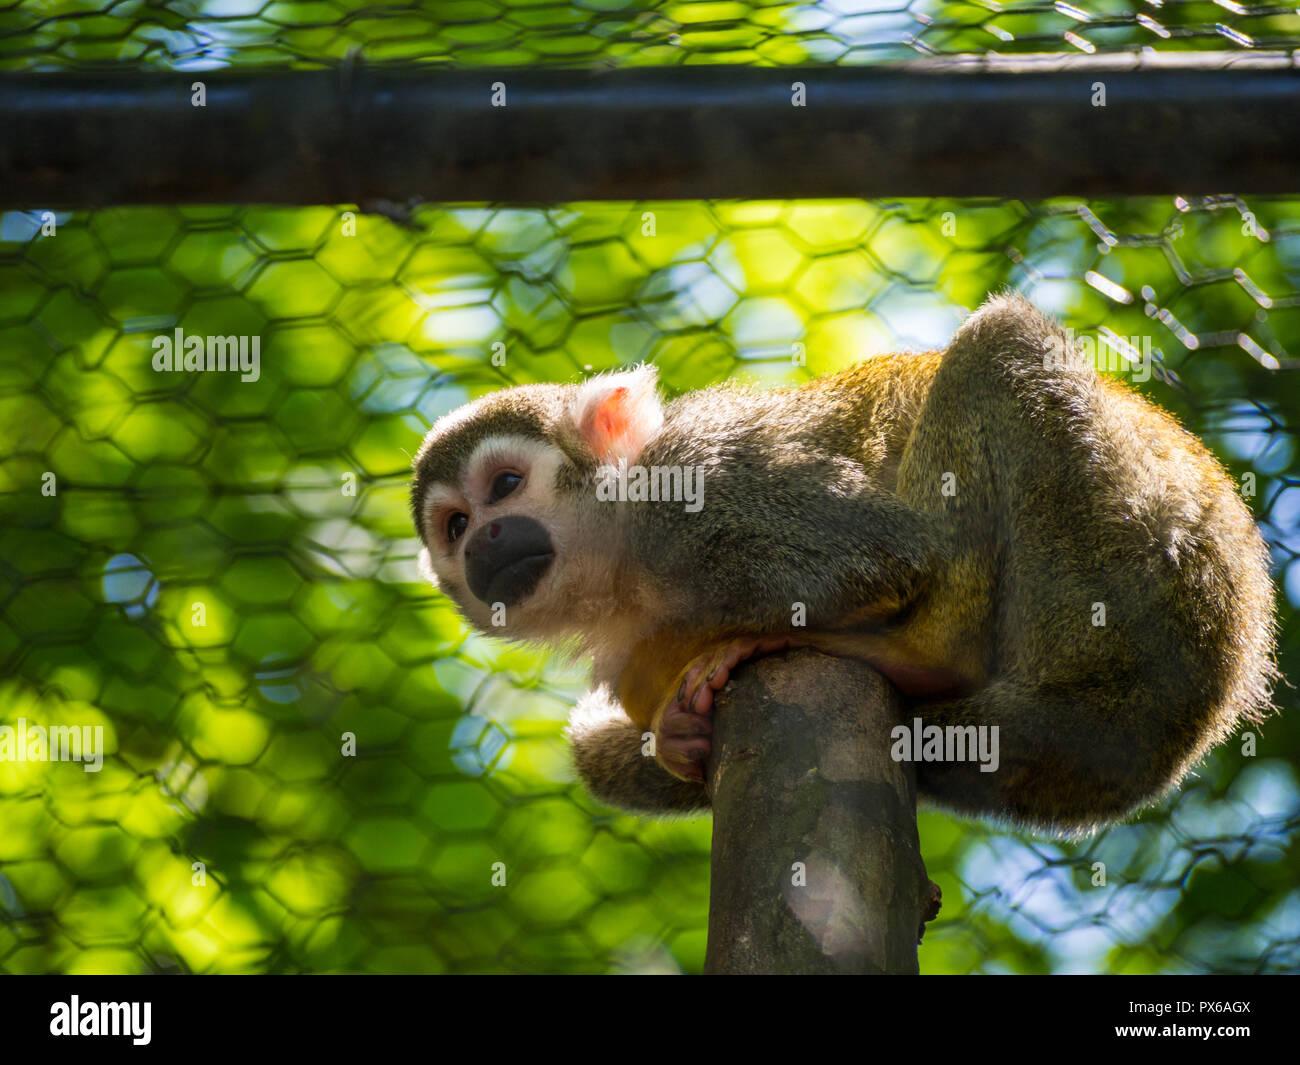 Squirrel monkeys in trees - photo#39